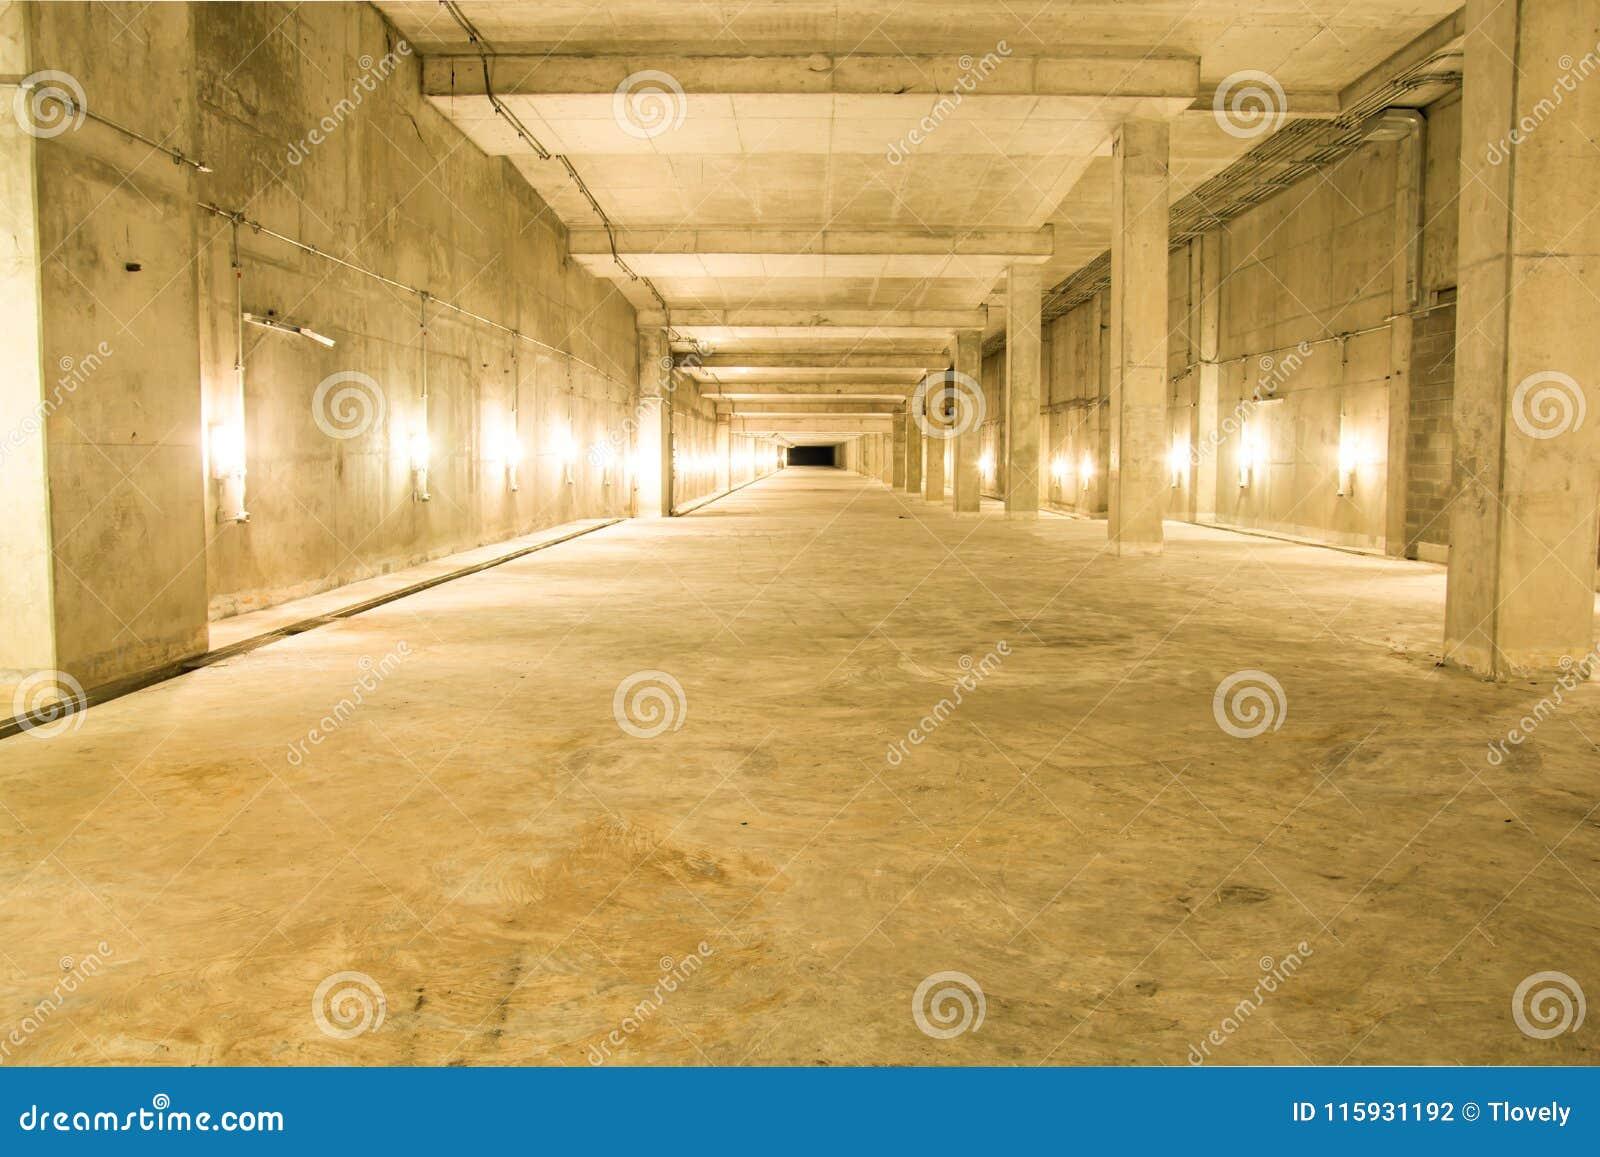 Empty Industrial Garage Room Interior With Concrete. Stock Photo ...